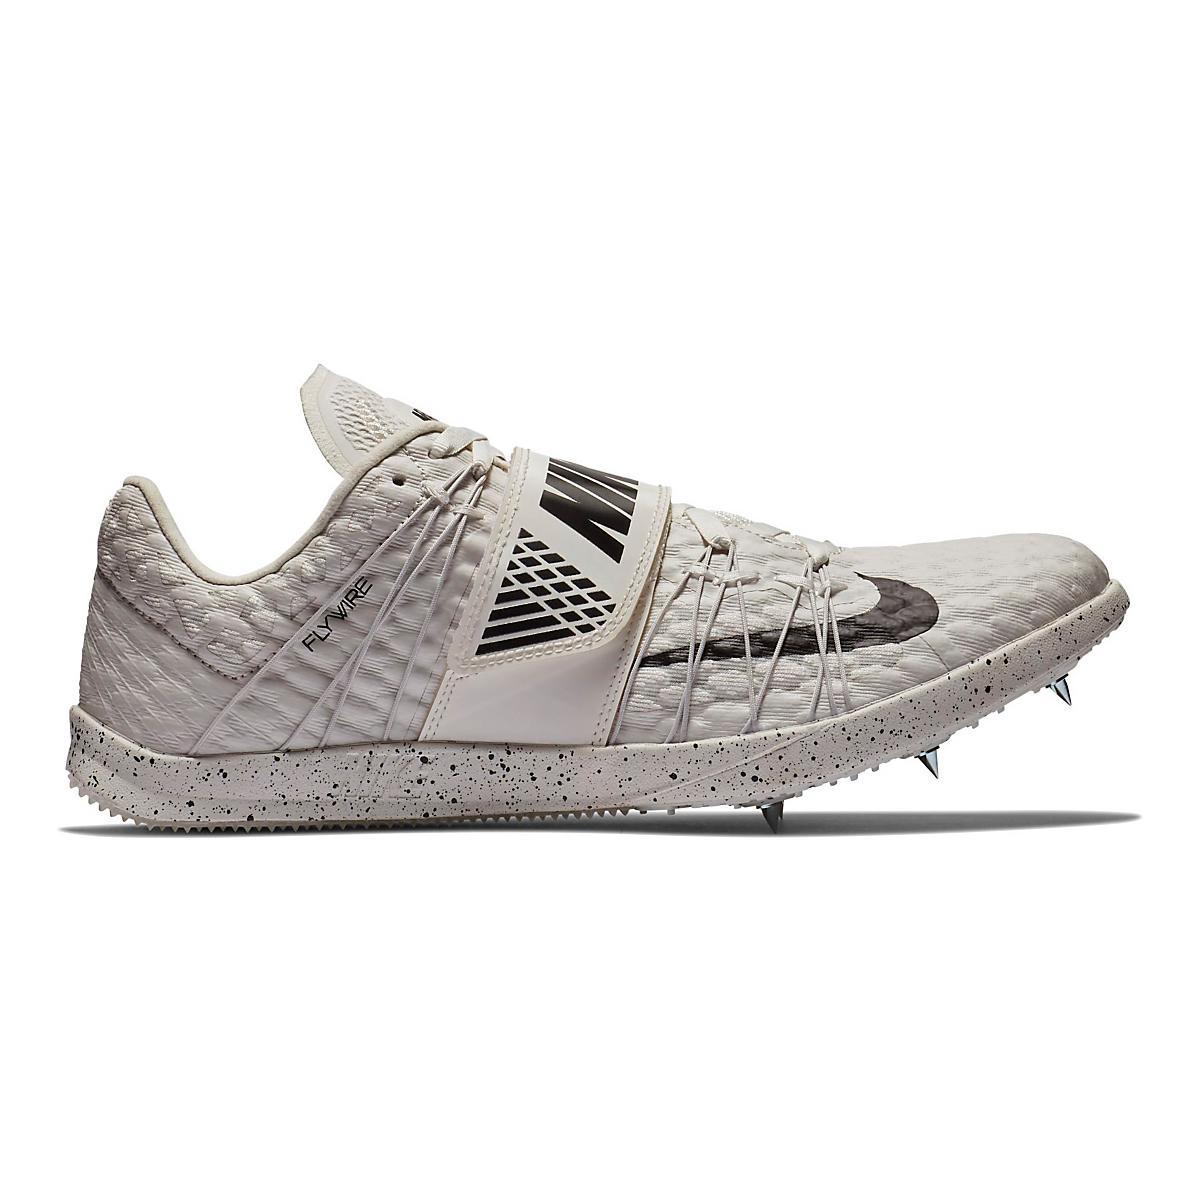 0175434147b7 Nike Triple Jump Elite Track and Field Shoe at Road Runner Sports